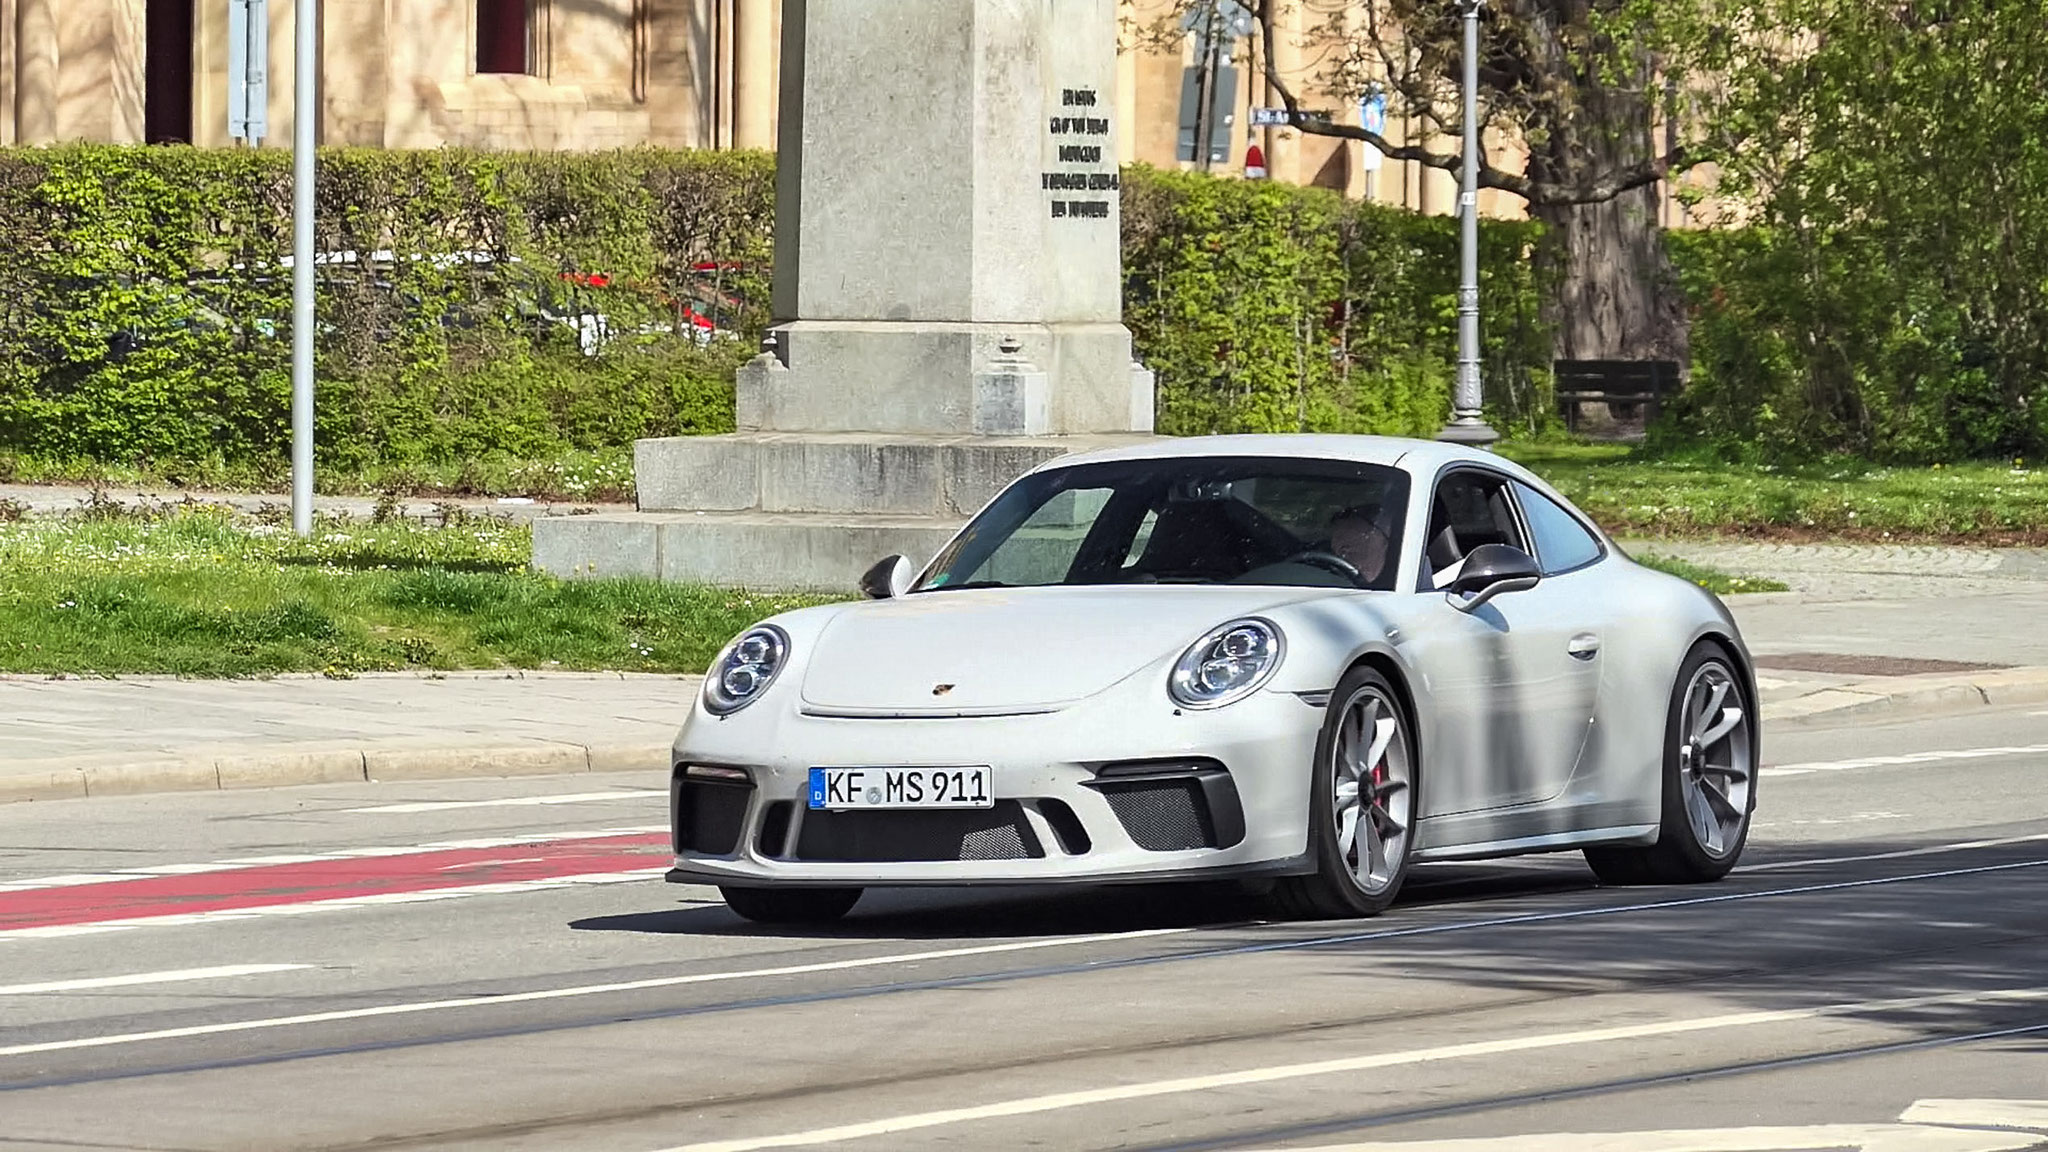 Porsche 991 GT3 Touring Package - KF-MS-911